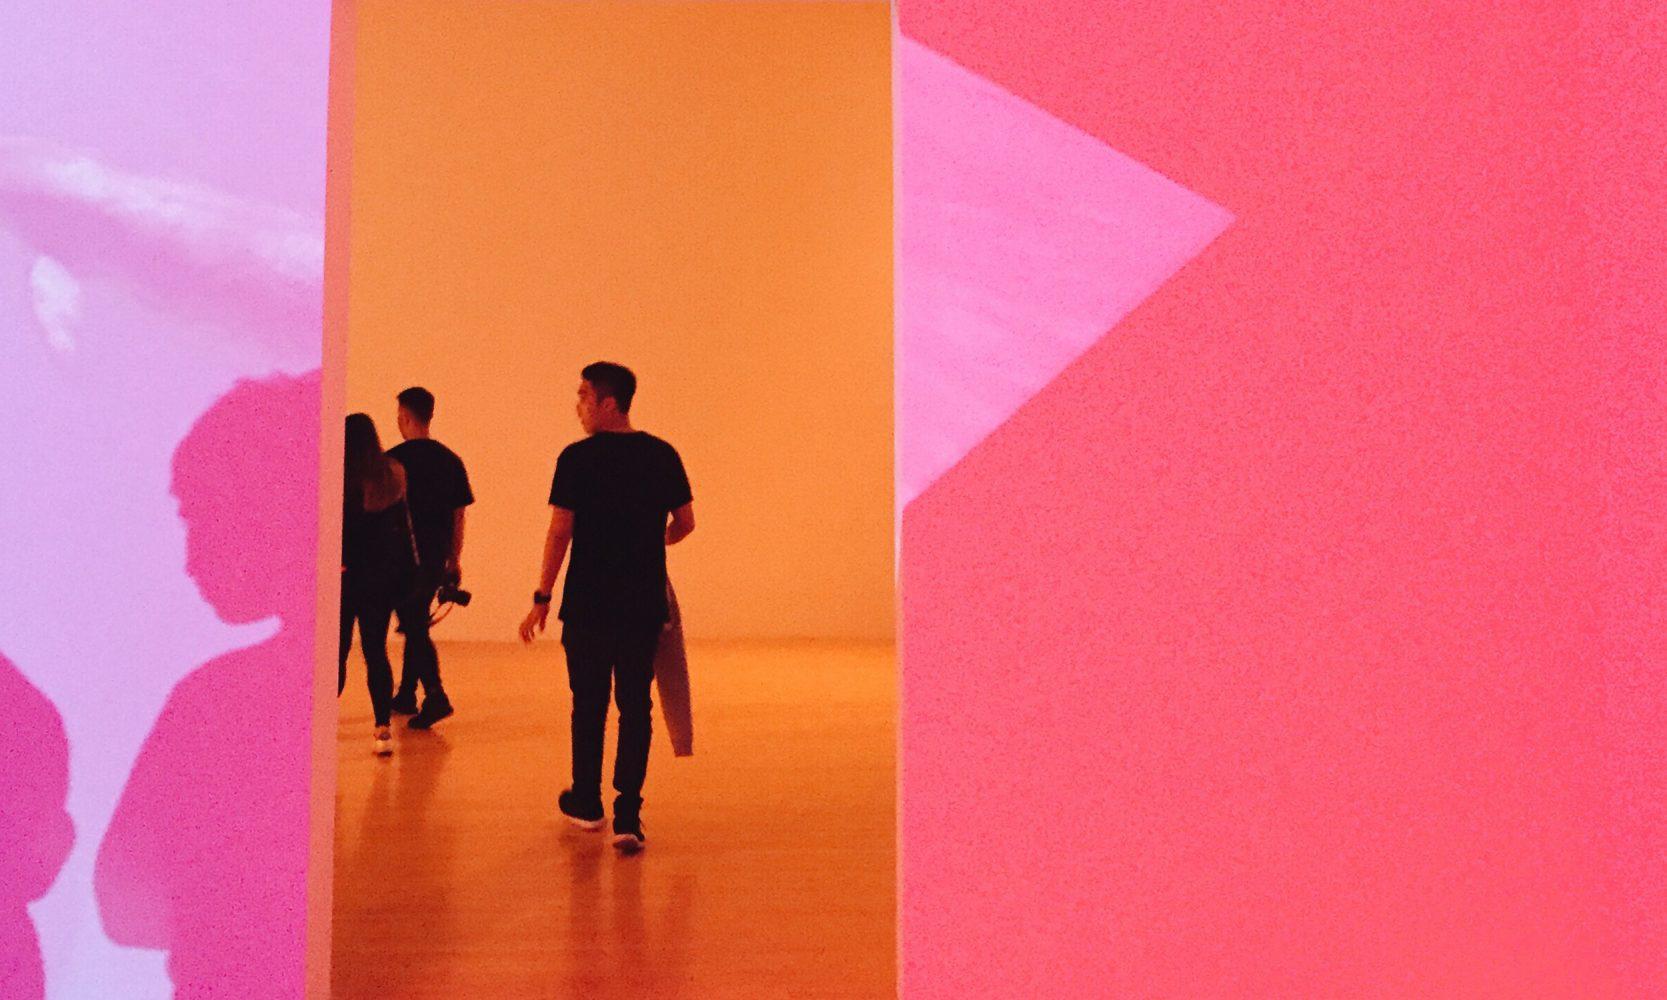 pink and orange art installation